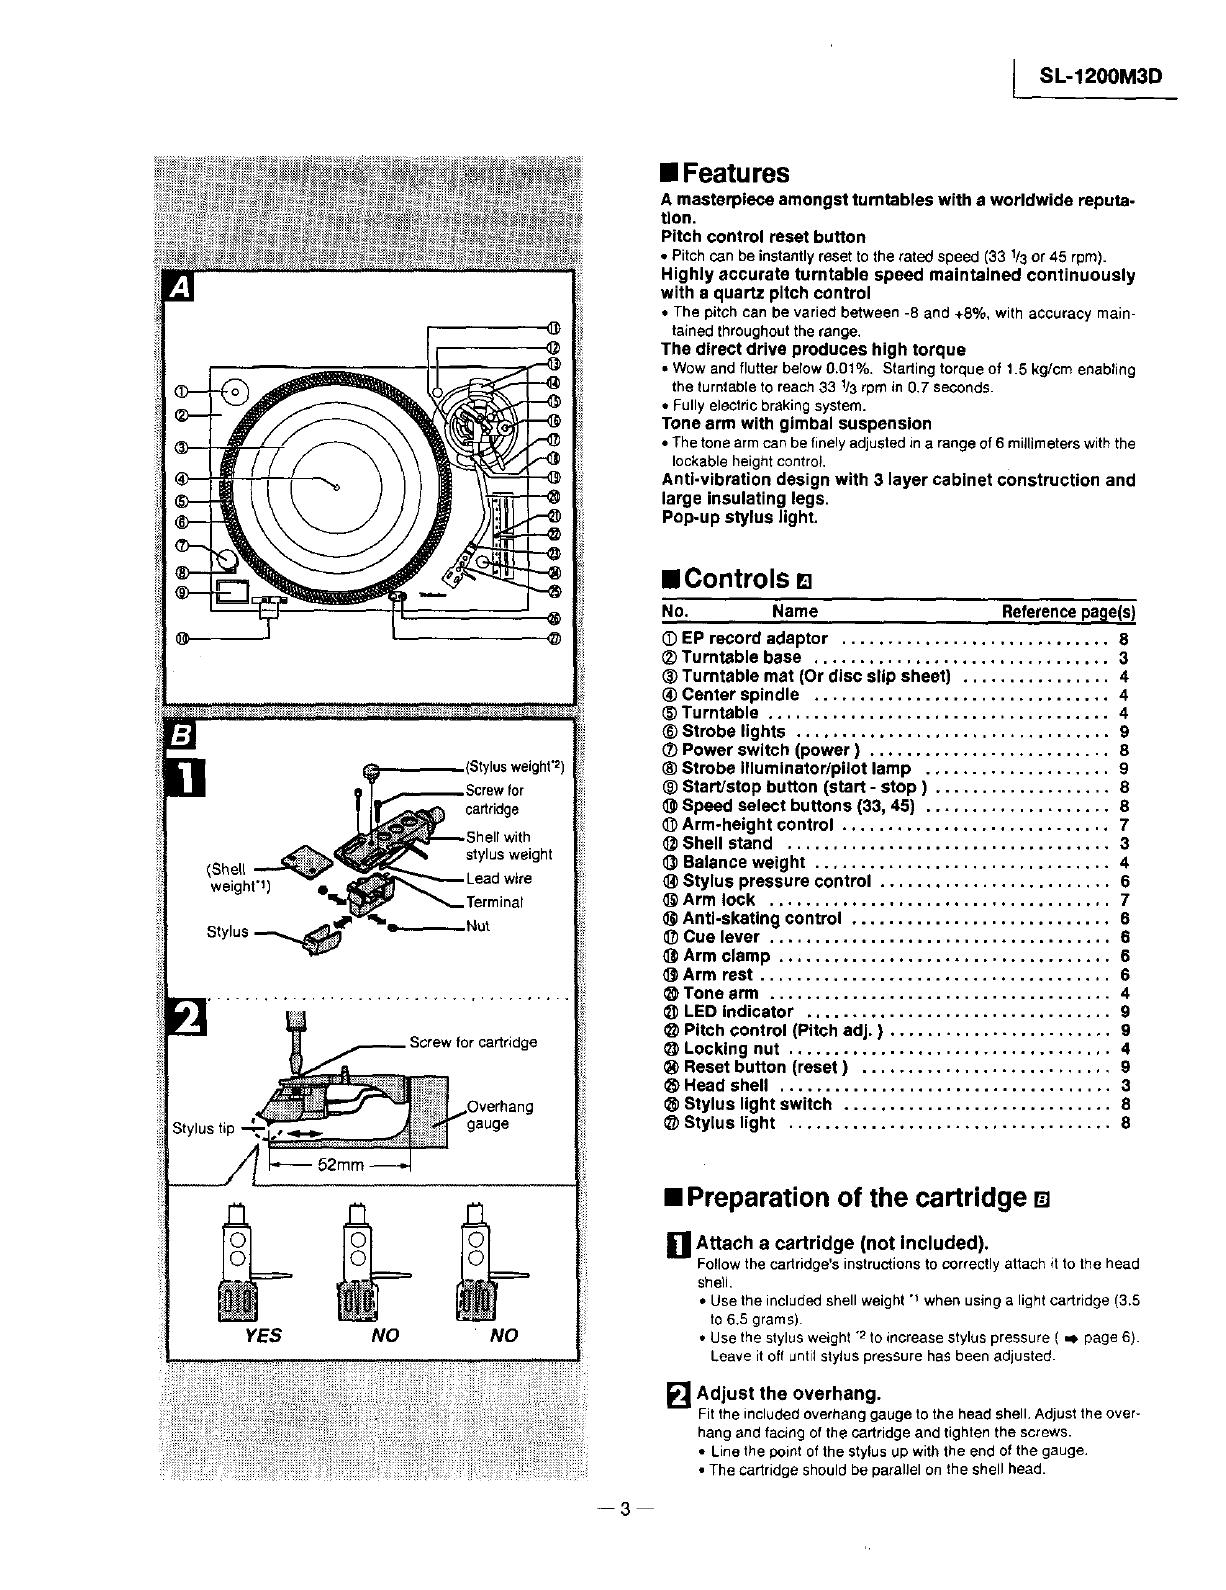 Panasonic Turntable Manual L9911037 Isl Wiring Diagram 1200m3d